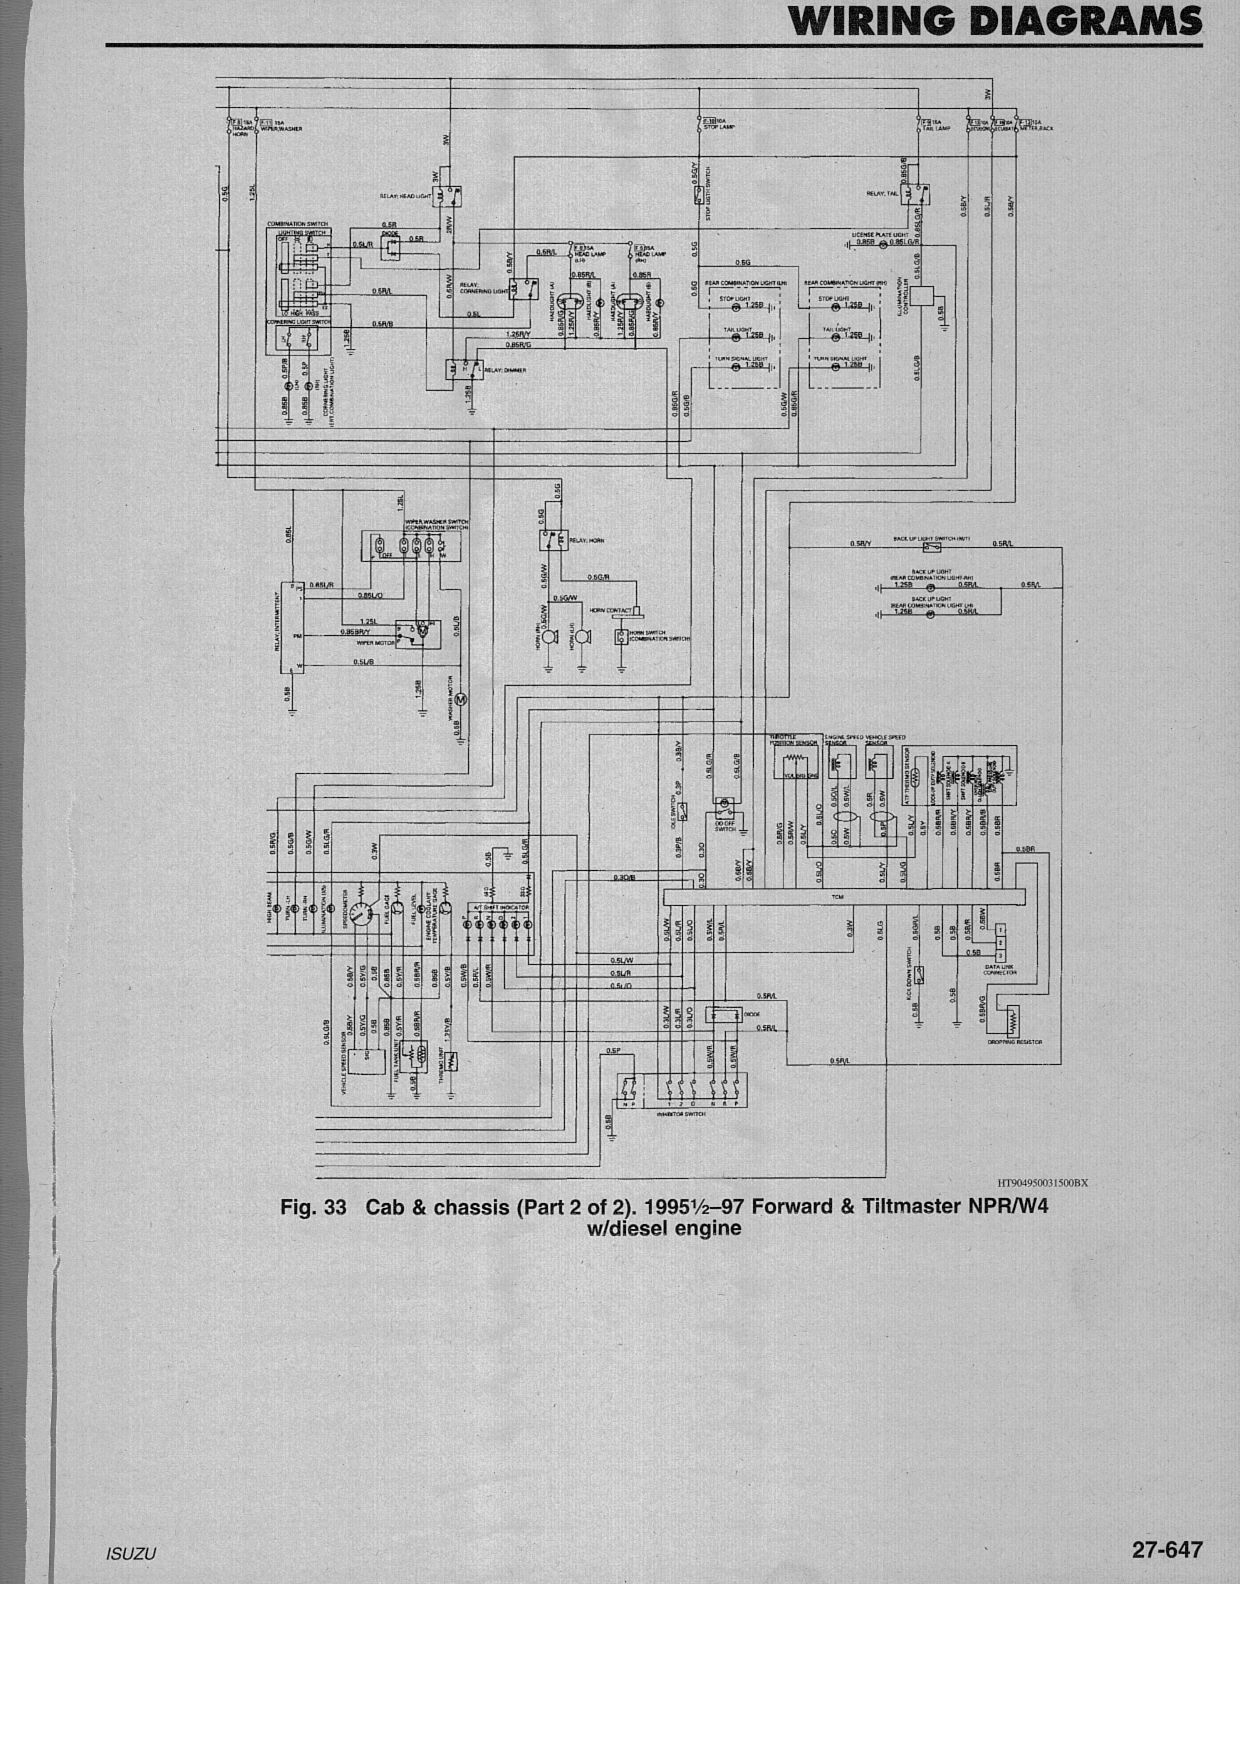 Npr Wiring Diagram | Manual E-Books - 2006 Isuzu Npr Wiring Diagram